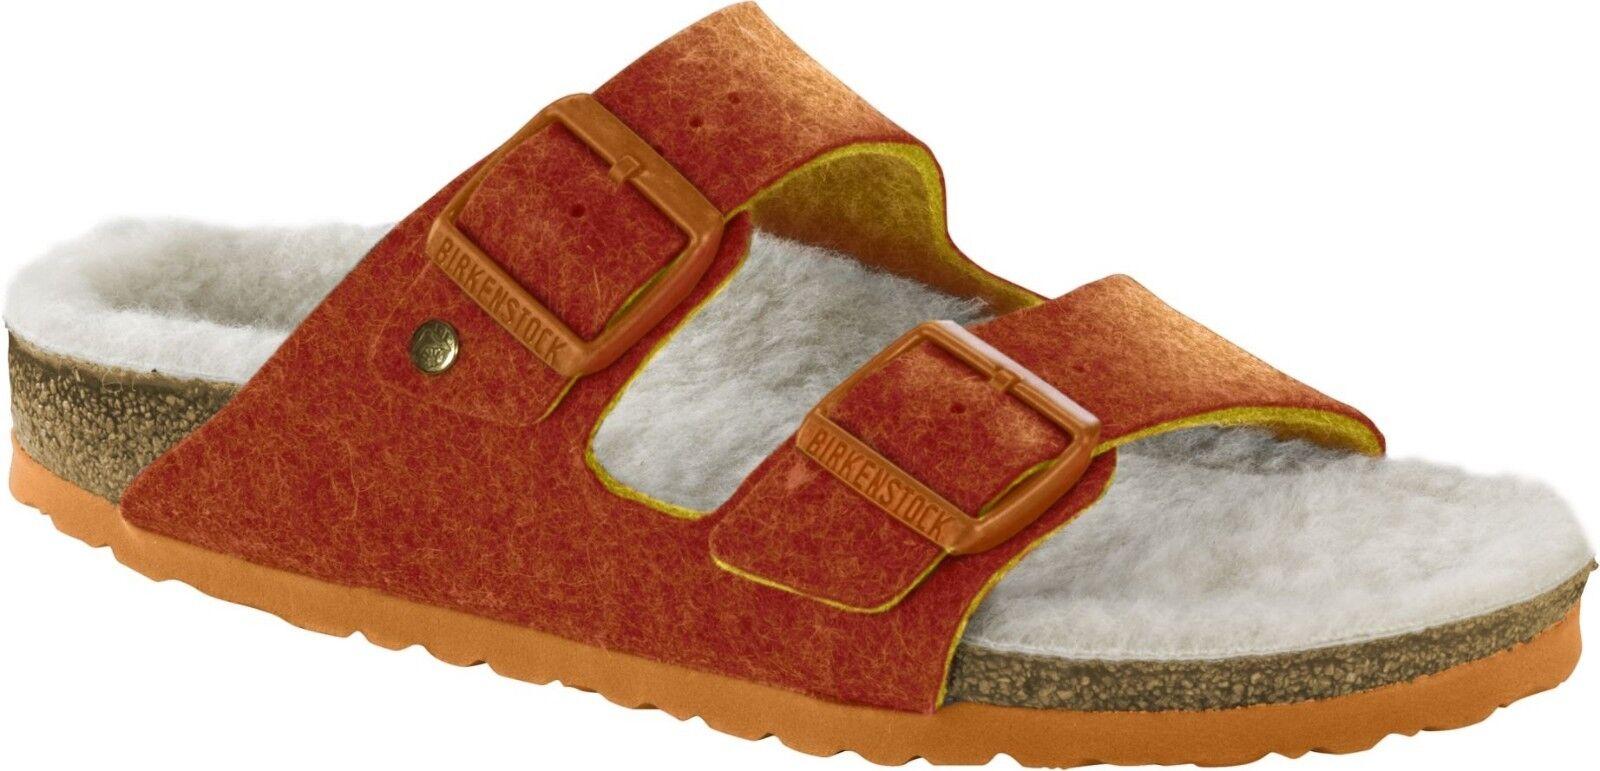 Birkenstock Arizona Doubleface Orange Fußbett Größe 38 Fußbett Orange schmal f49e8e